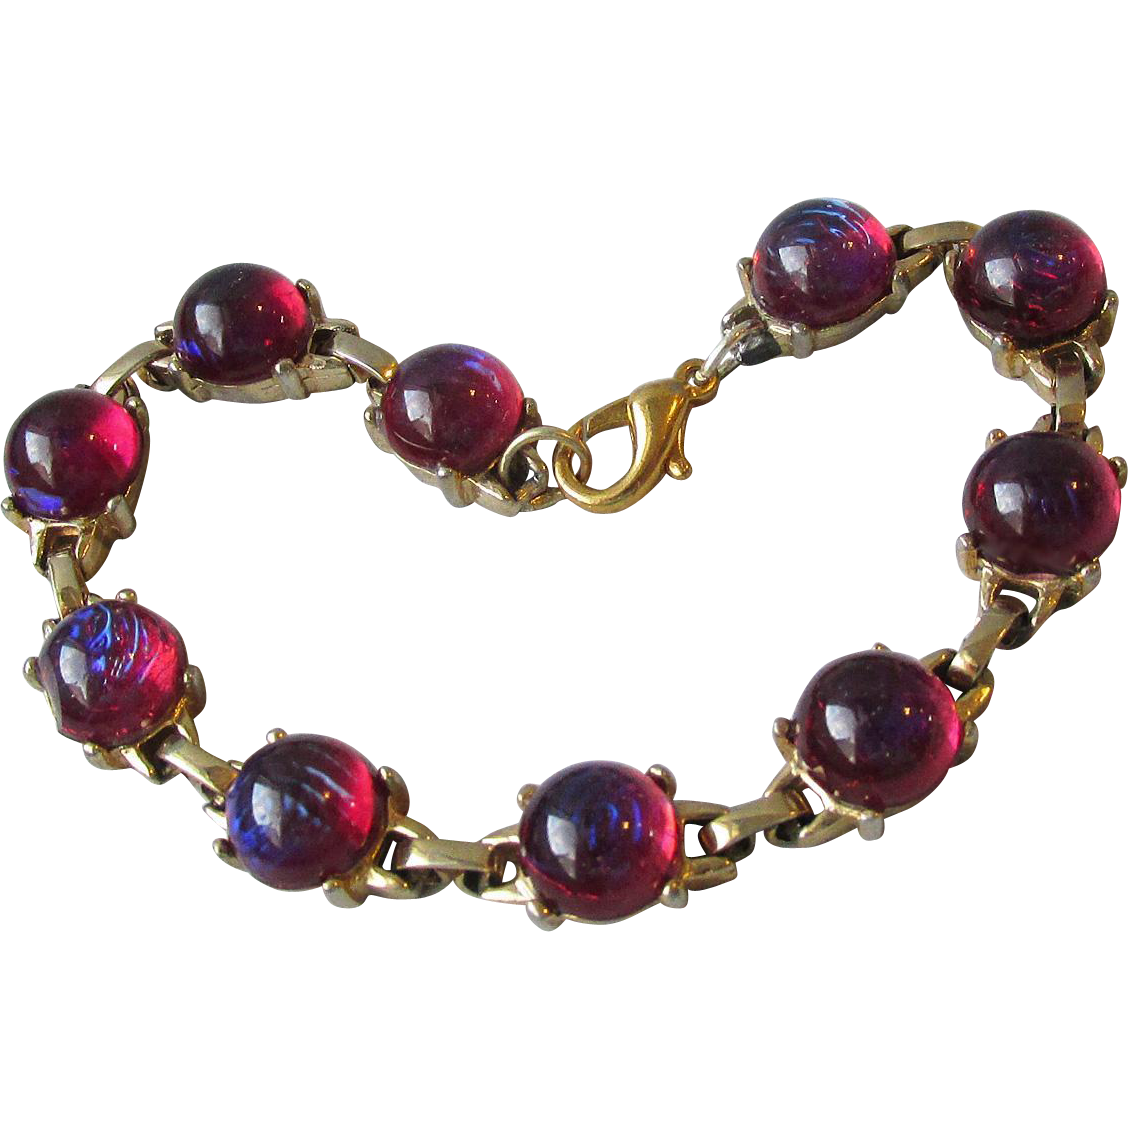 Vintage 1960's Dragon's Breath Glass Cabochon Gold Filled Bracelet